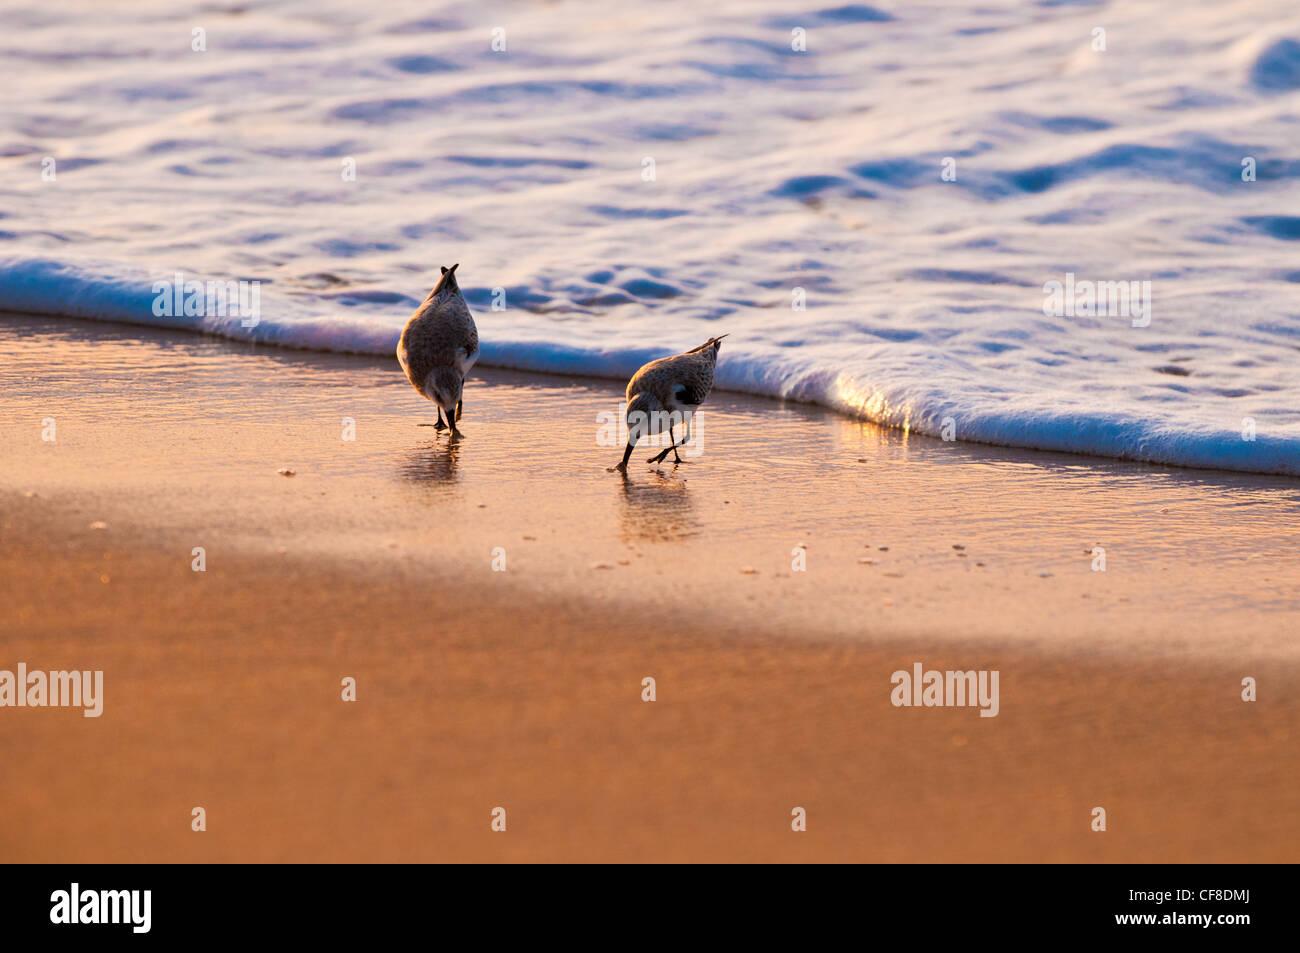 "Les Bécasseaux sanderling-'Hunakai"" en langue hawaiienne (Calidris alba), Polihale Beach, Kauai, Hawaii Banque D'Images"